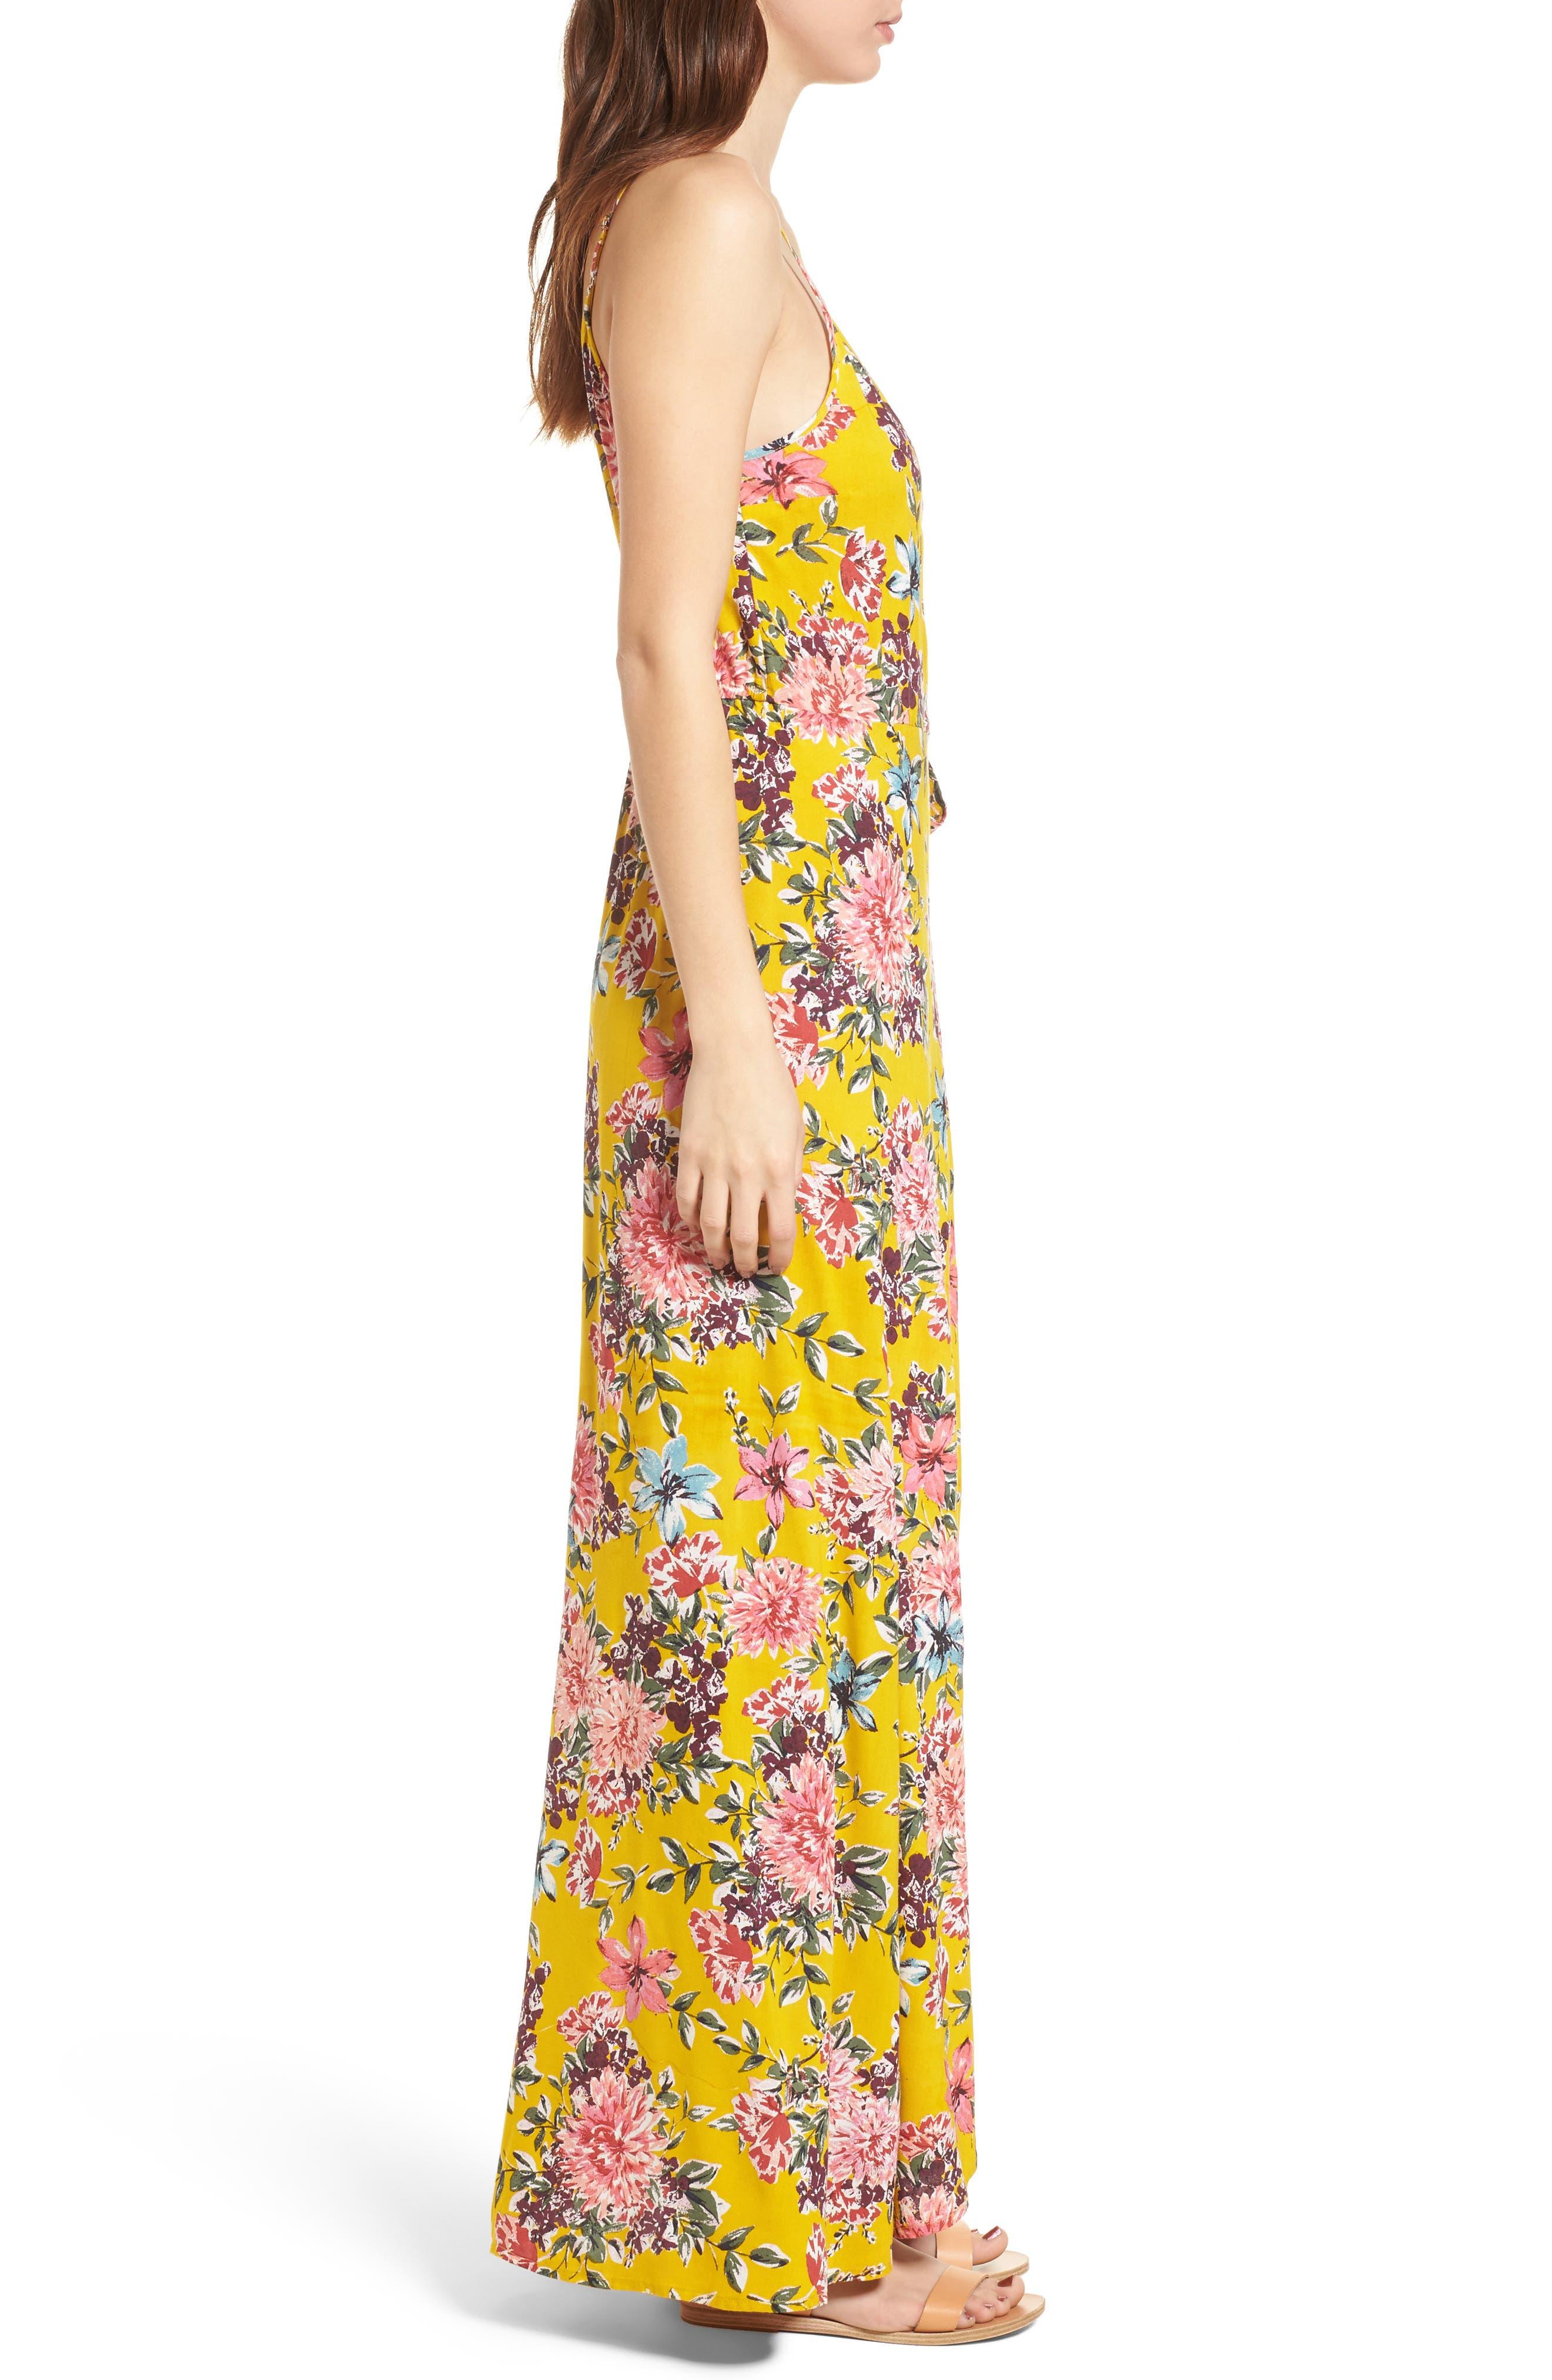 Chrysanthemum Wrap Front Dress,                             Alternate thumbnail 3, color,                             703